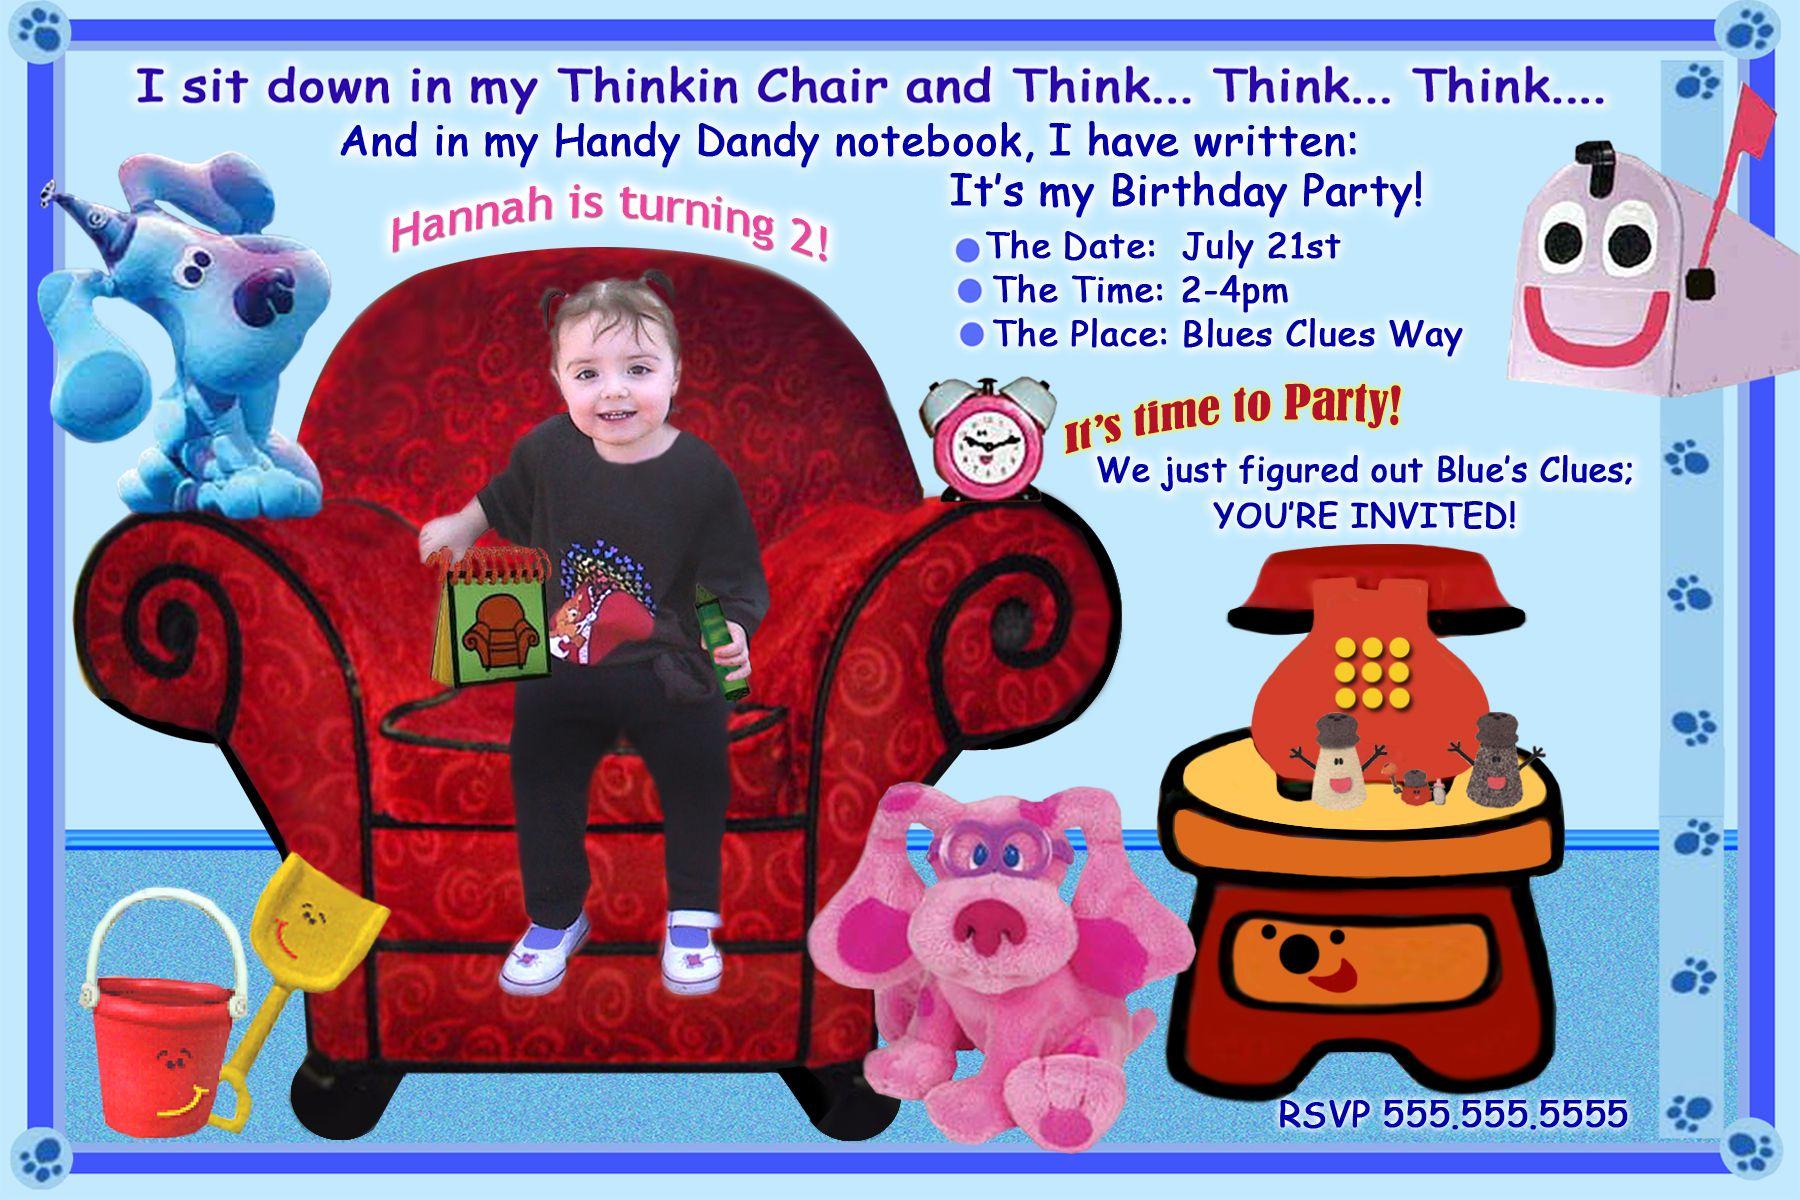 Free Blues Clues Birthday Invitations Ideas   Bagvania Invitation - Blue's Clues Invitations Free Printable